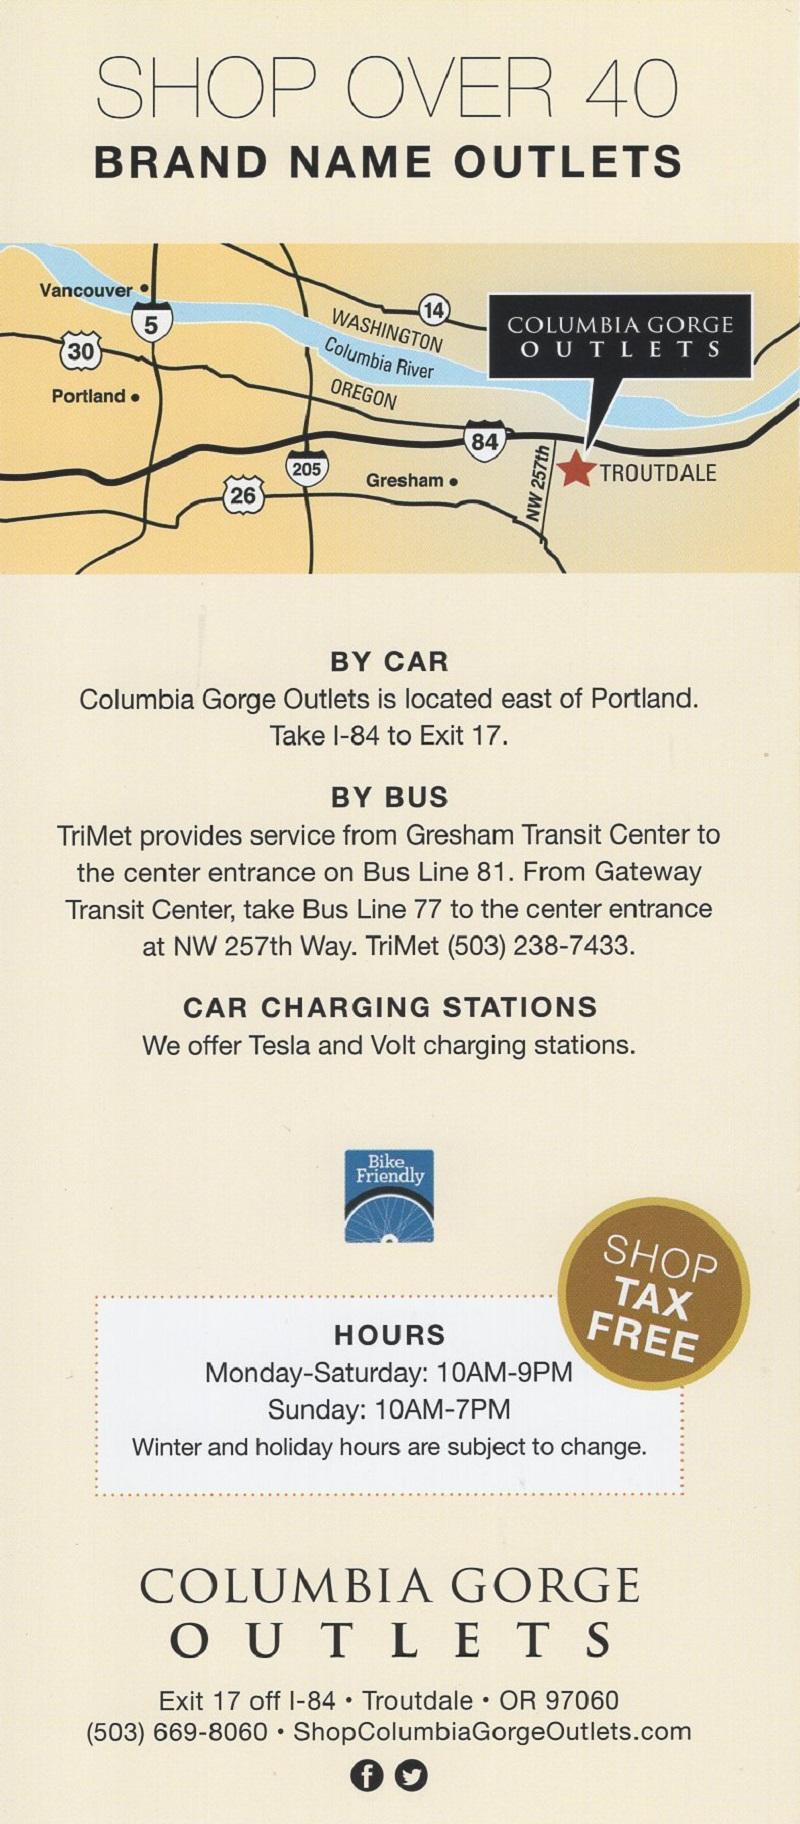 Columbia Gorge Outlets brochure thumbnail